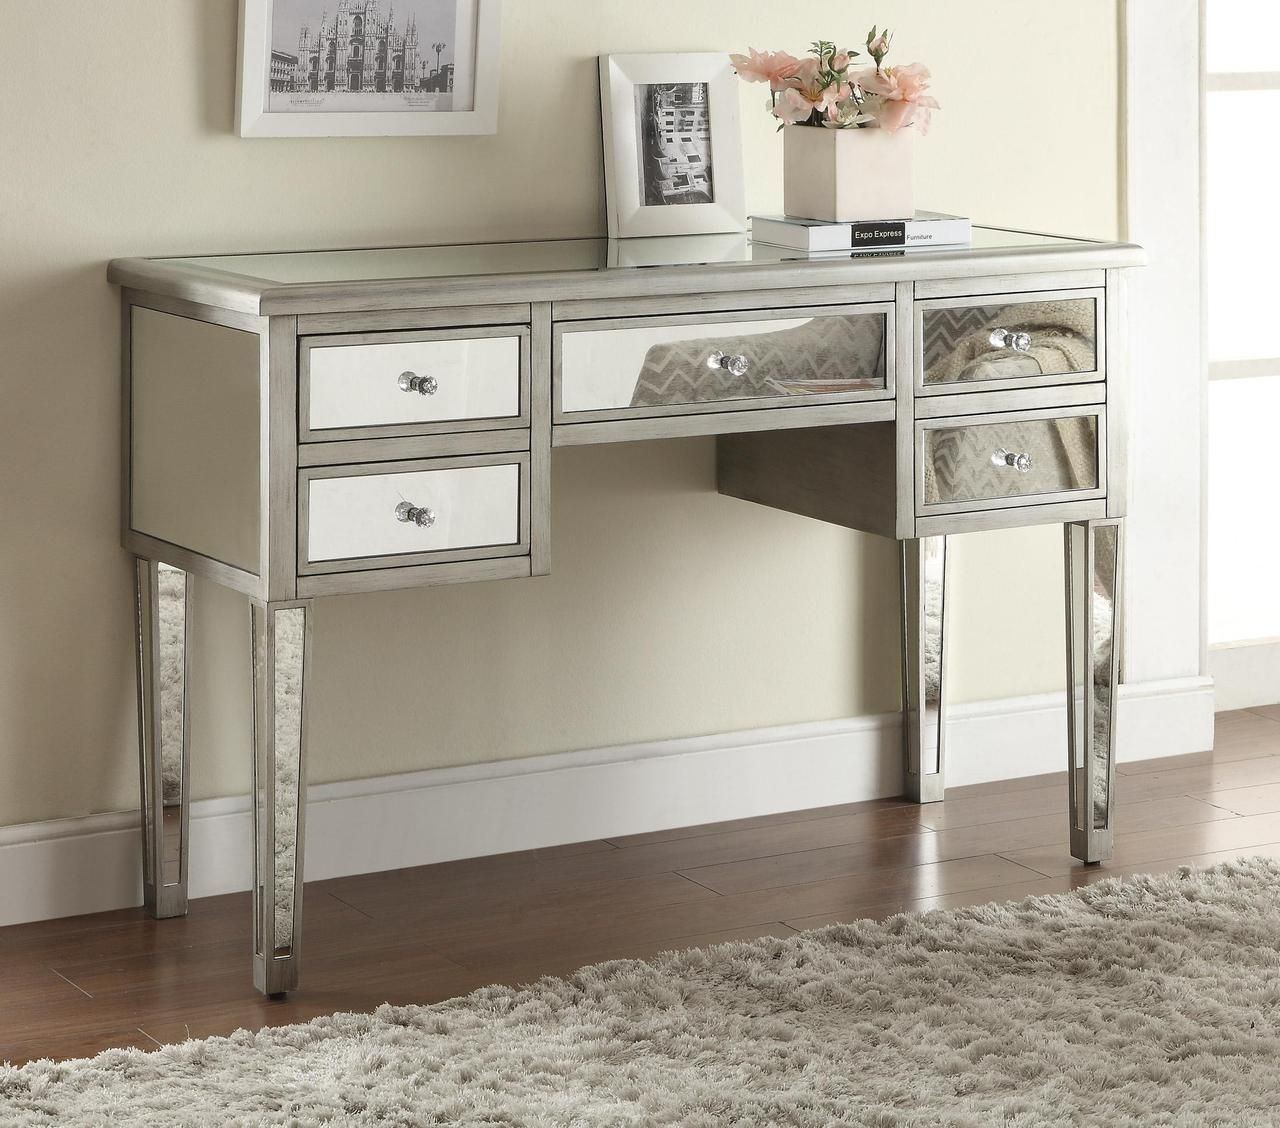 Console table vanity ideas argharts pinterest